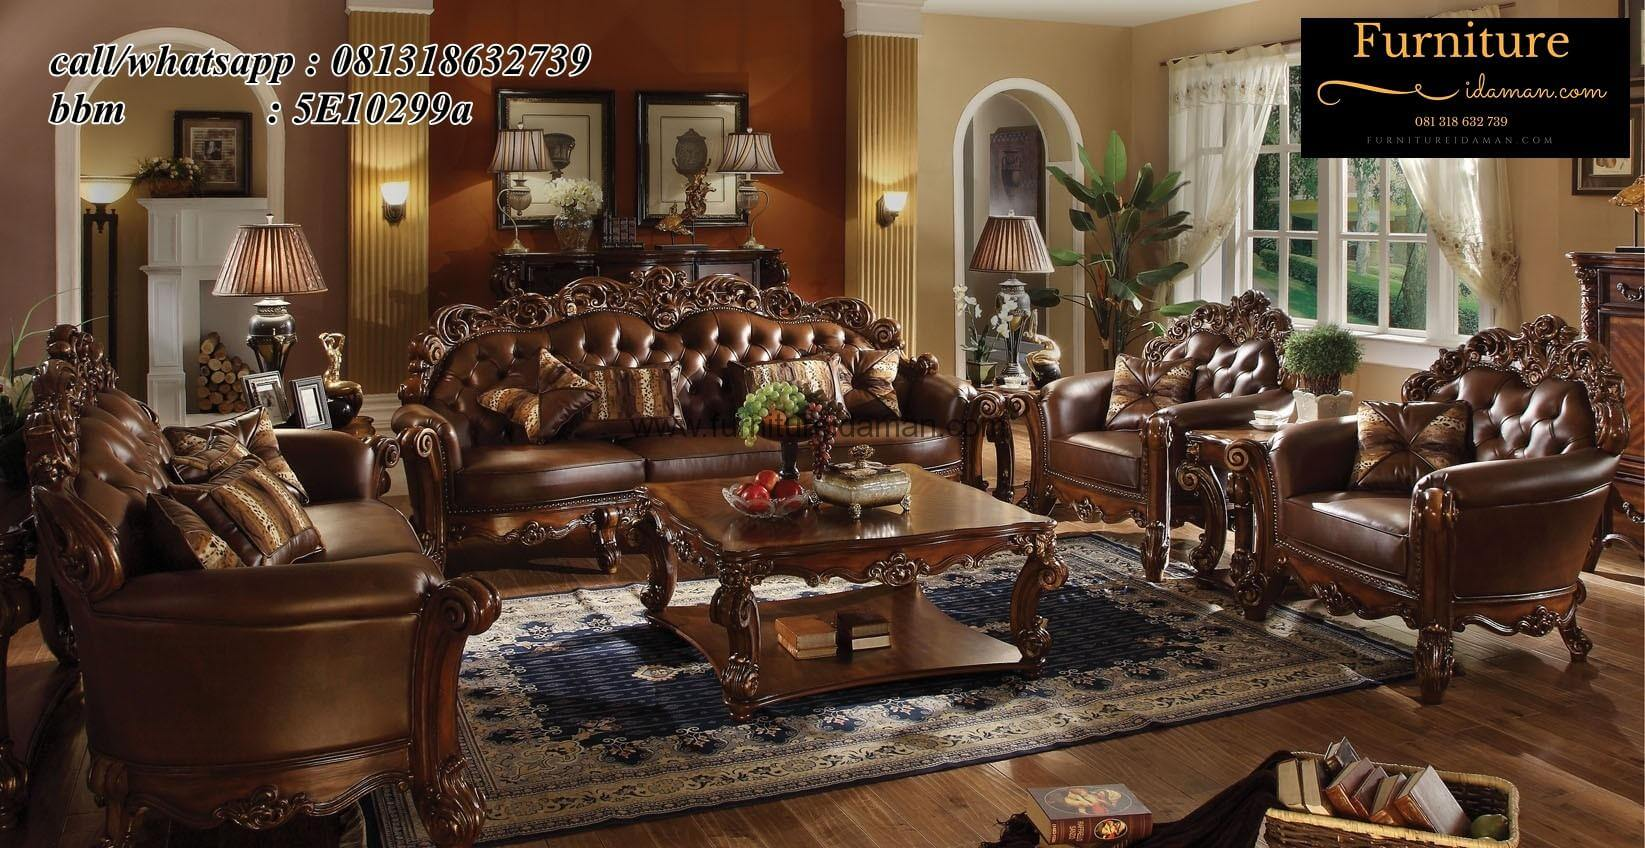 Set Sofa Tamu Klasik Etnik Ukiran KSI-62,kursi tamu,harga sofa,kursi tamu minimalis,sofa minimalis,harga kursi tamu,kursi minimalis,harga sofa minimalis,meja makan,sofa murah,meja makan minimalis ,sofa ruang tamu ,harga kursi ,sofa minimalis murah ,kursi sofa,model sofa,harga sofa ruang tamu,model kursi tamu,harga meja makan,harga sofa murah,harga kursi tamu minimalis,harga kursi sofa,meja makan murah,jual sofa,kursi tamu murah,sofa tamu,model sofa terbaru,jual sofa minimalis,harga meja makan minimalis,harga kursi minimalis,harga kursi kayu Bantal sofa, desain kursi tamu, design sofa, furniture kursi tamu, furniture sofa, gambar kursi ruang tamu, harga kursi sofa, harga kursi tamu, harga kursi tamu jati, harga kursi tamu jati ukir jepara, harga kursi tamu murah, Harga Sofa Klasik, jual sofa murah, jual sofa tamu, kursi sofa jati, kursi tamu jepara, kursi tamu ukiran, Model Sofa Klasik, model sofa tamu, sofa besar, sofa jati,jepara,furnitureidaman.com,furnitureidaman,kursi sofa mewah,set kursi tamu,kursi tamu minimalis,sofa minimalis,sofa mewah,sofa jepara,kursi tamu sofa,kursi sofa terbaru,kursi sofa model terbaru,sofa terbaru,sofa terbaru 2017,sofa berkualitas,furnitureklasik,sofa,sofamurah,furnitureclasik,sofa victorian,sofa turkey,sofa italian,sofa eropa,furniture sofa, gambar sofa jepara, harga sofa bed, harga sofa bed minimalis, harga sofa kulit, harga sofa minimalis modern, jual sofa bed, model model sofa, model sofa bed, model sofa minimalis, sarung bantal sofa, sofa, sofa ace hardware, sofa anak, sofa anak lucu, sofa angin, sofa angin 5 in 1, sofa angin bestway, sofa angin kaskus, sofa angin murah, sofa angsa jepara, sofa antik, sofa atria, sofa bandung, sofa bed, sofa bed anak, sofa bed bandung, sofa bed informa, sofa bed inoac, sofa bed murah, sofa bekas, sofa bola, sofa boneka, sofa cafe murah, sofa cantik, sofa cantik minimalis, sofa cellini, sofa cellini bekas, sofa cikarang, sofa cinta, sofa classic, sofa cleopatra, sofa custom jakarta, sofa dan hargan